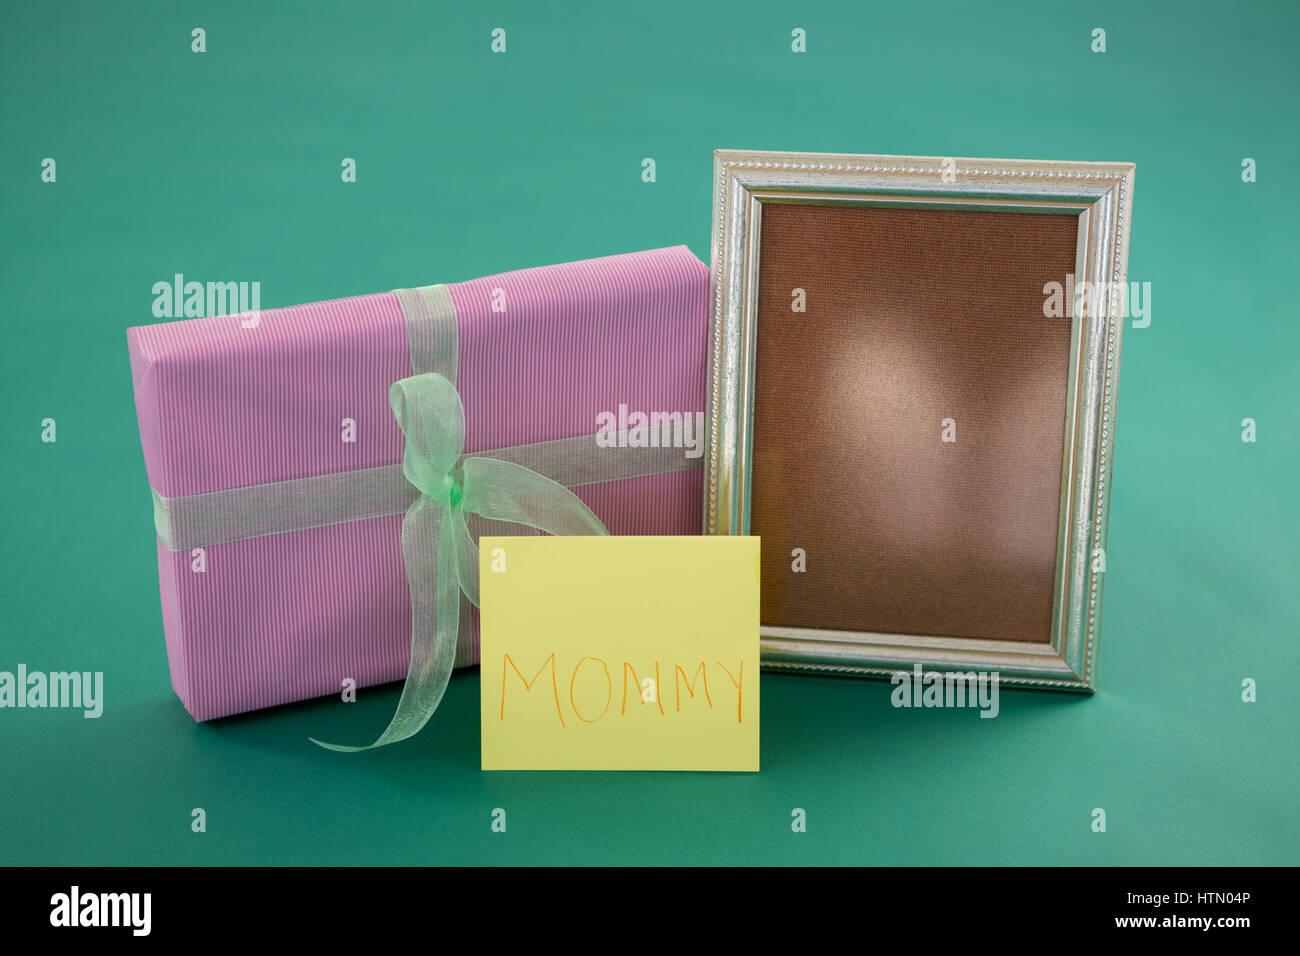 Groß Acrylbox Bilderrahmen Galerie - Benutzerdefinierte Bilderrahmen ...